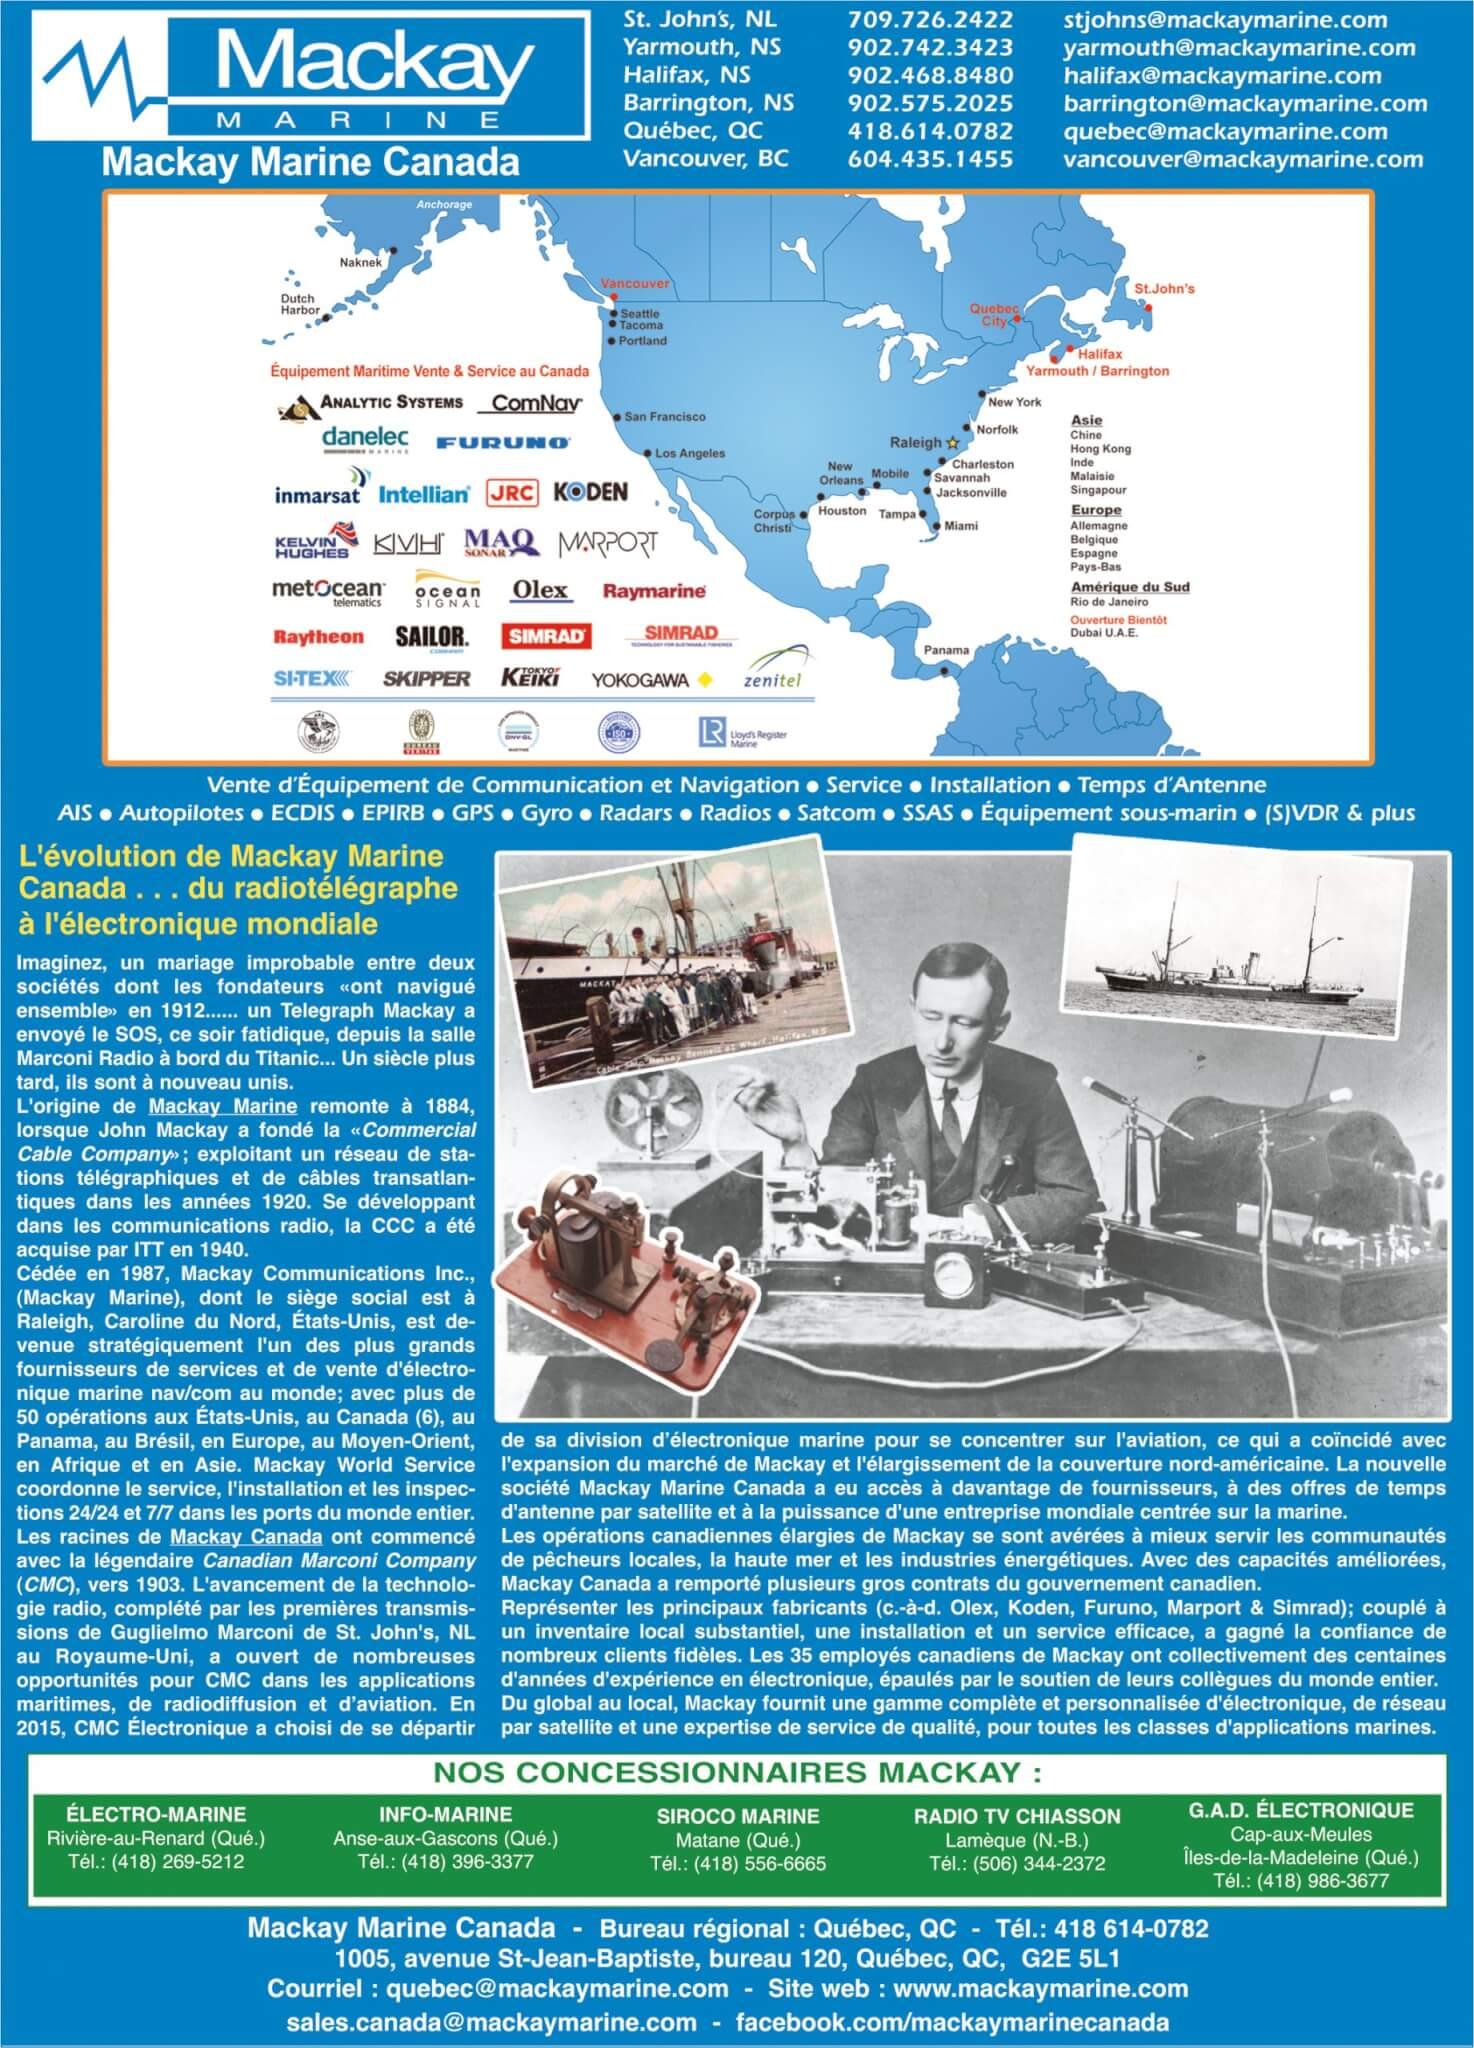 Mackay Marine Canada